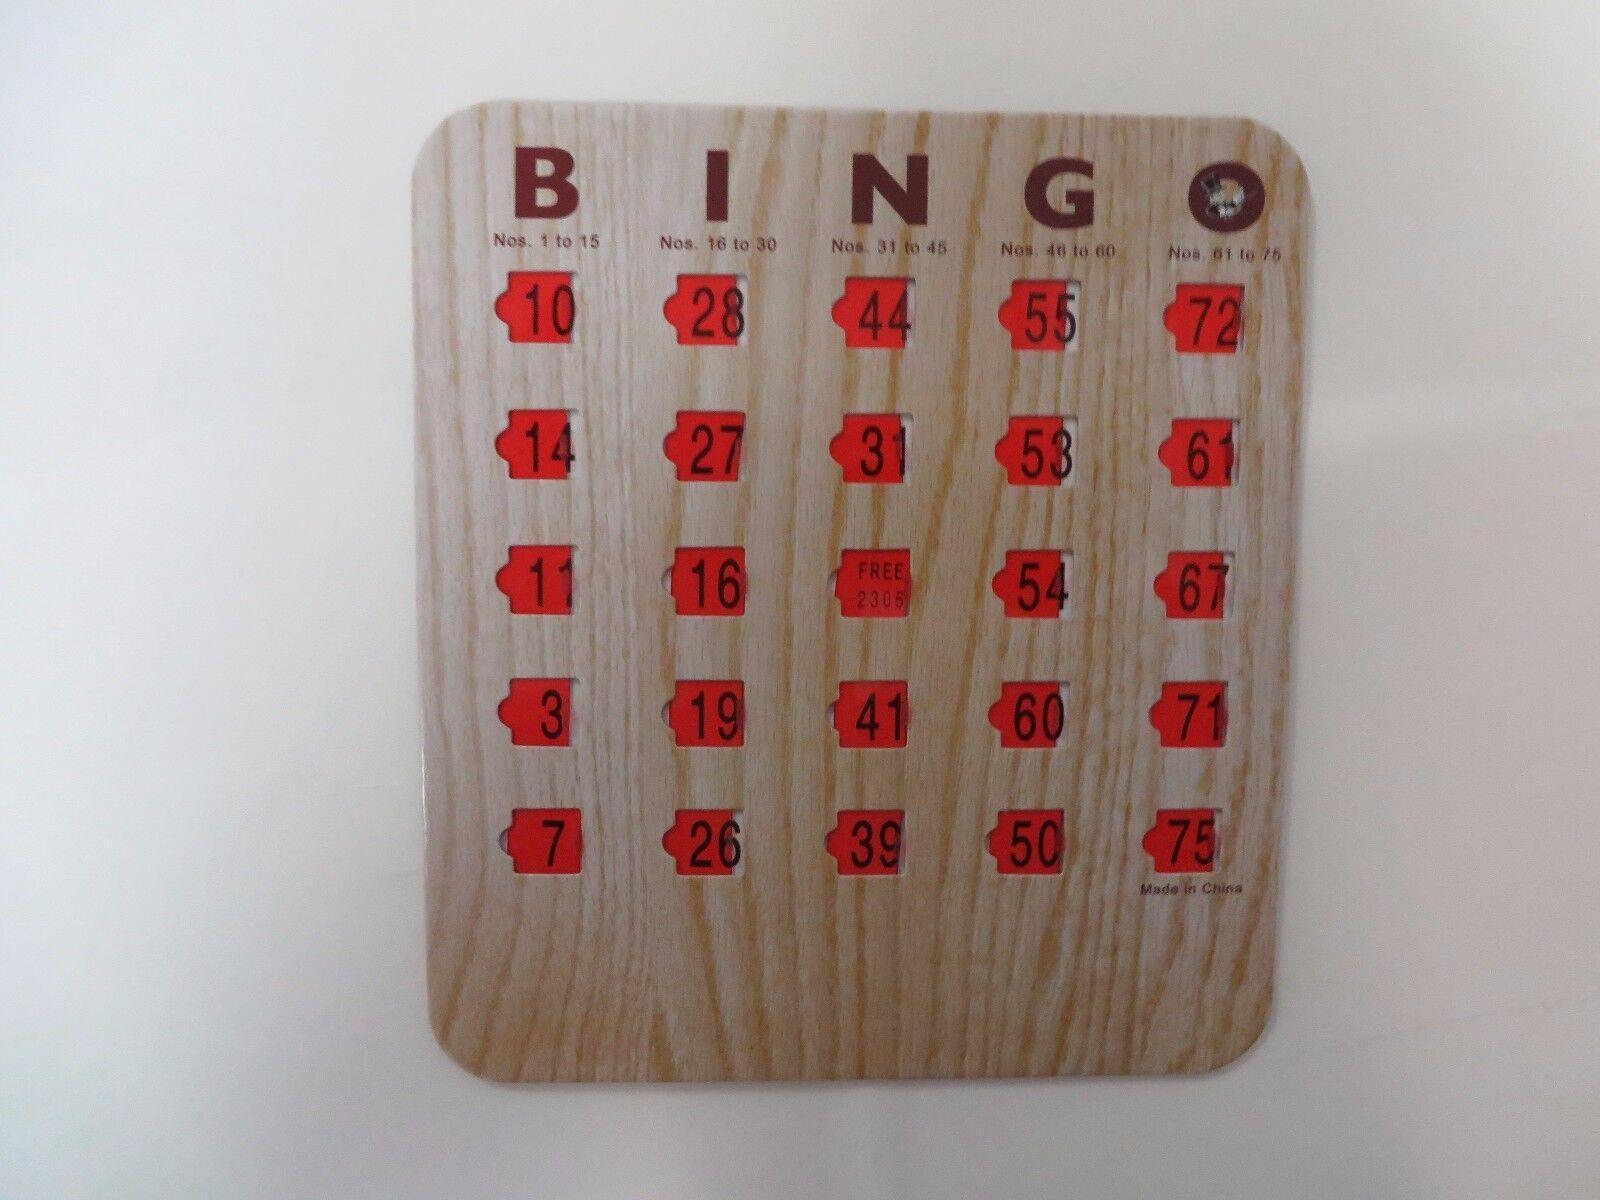 50 Bingo nuevo, tarjeta rápida, madera, 5 pisos lujosos.